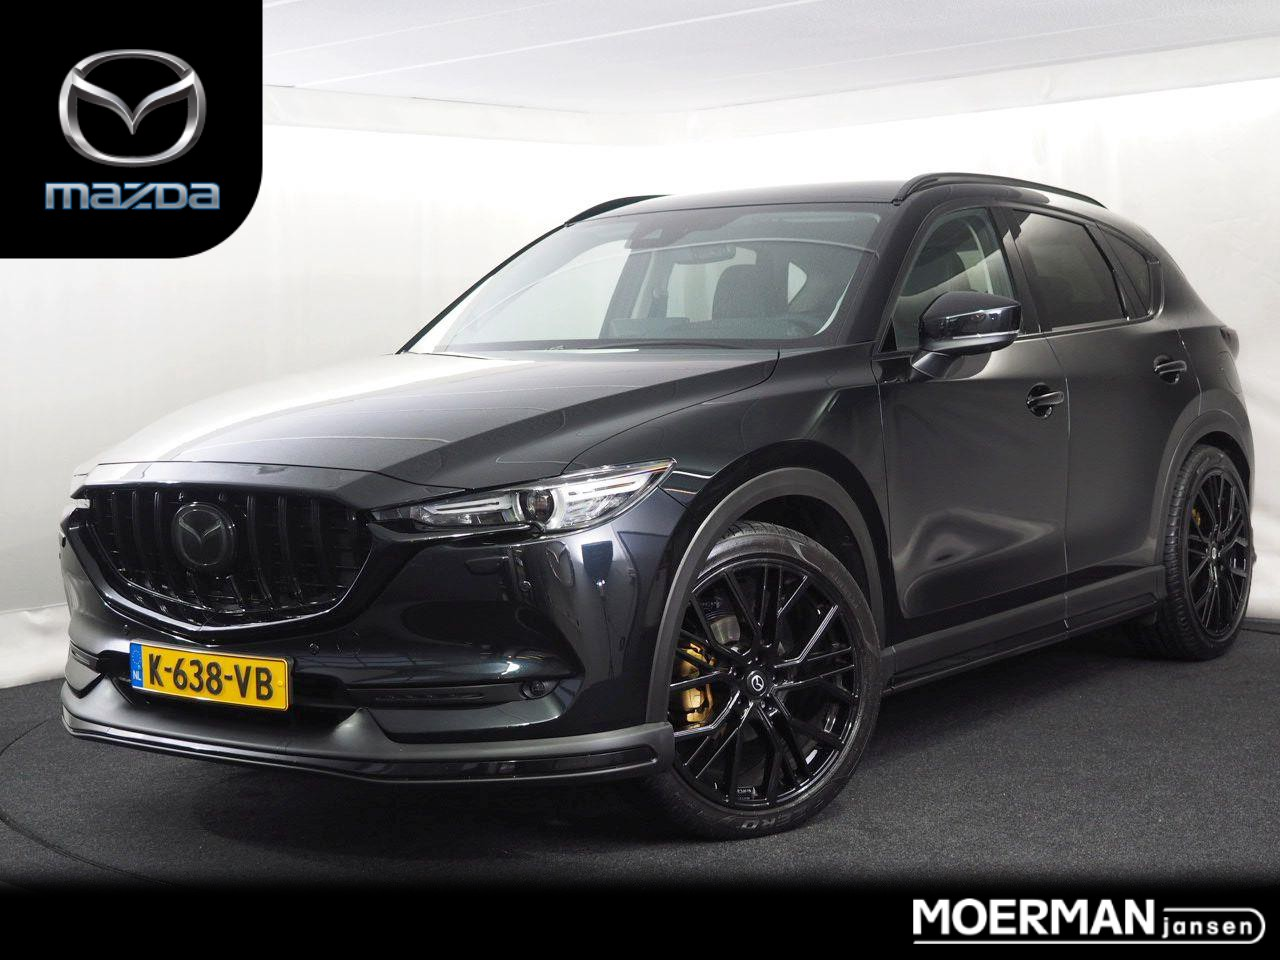 Mazda Cx-5 2.0 luxury rogue ii / speciale dealerdemo! / black on black!